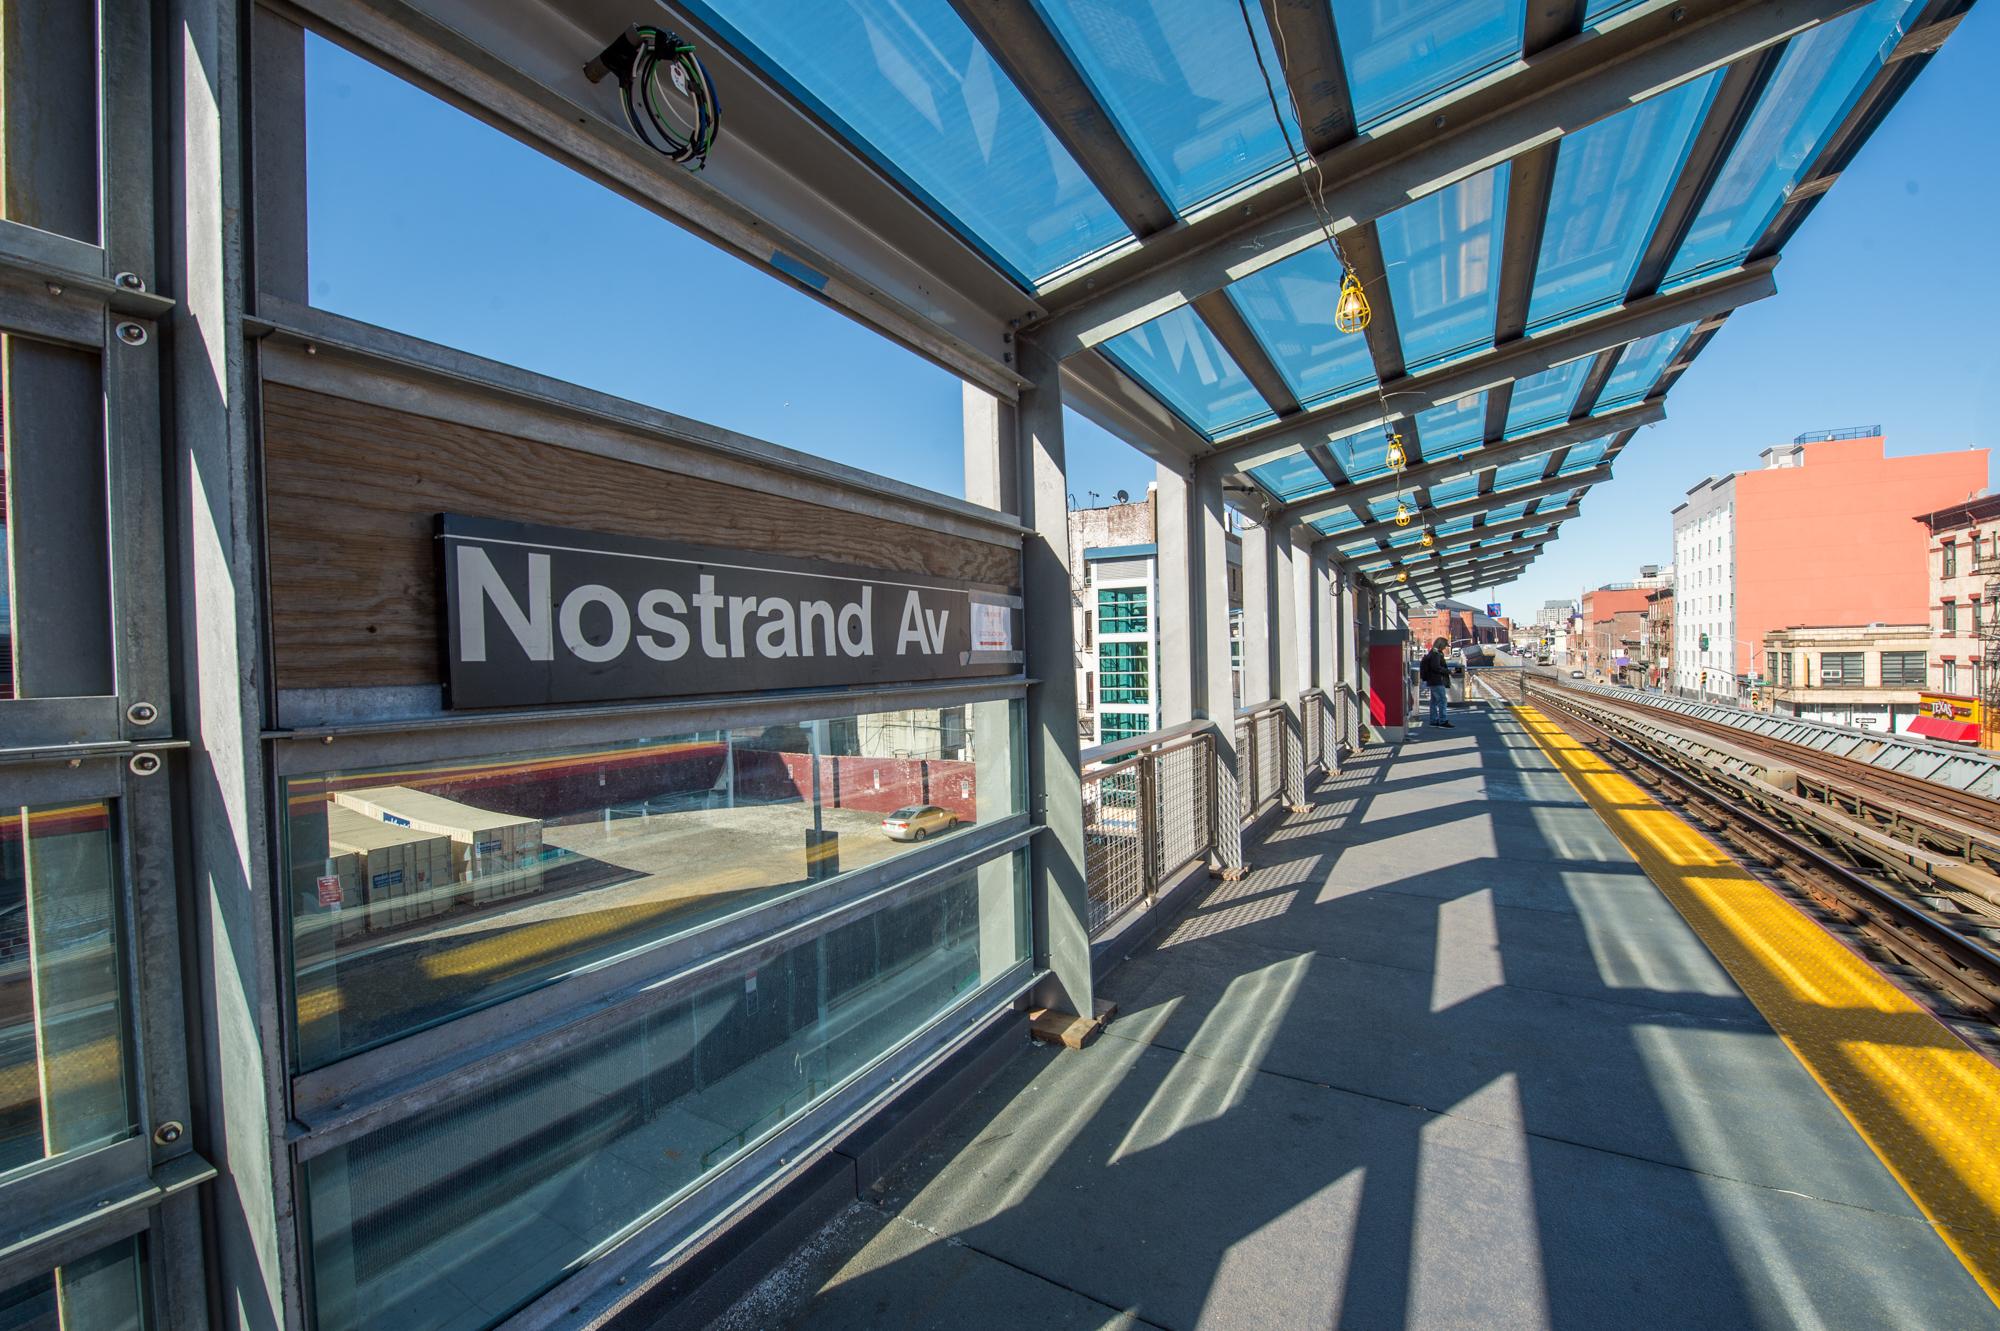 Nostrand Avenue Station Rehabilitation - 03-28-19